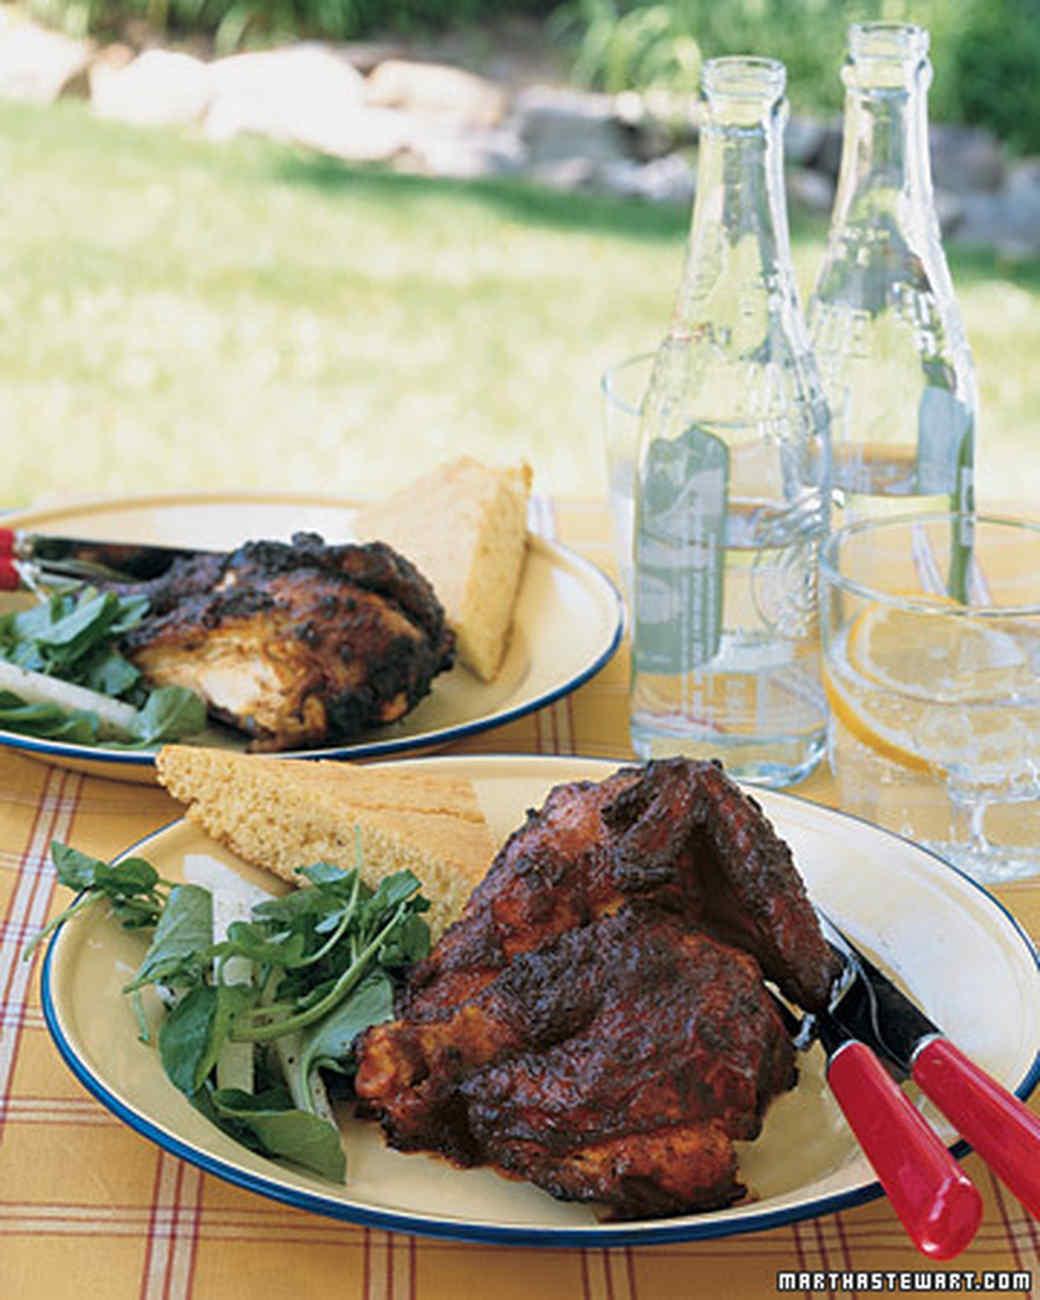 mla102459_0607_chicken.jpg